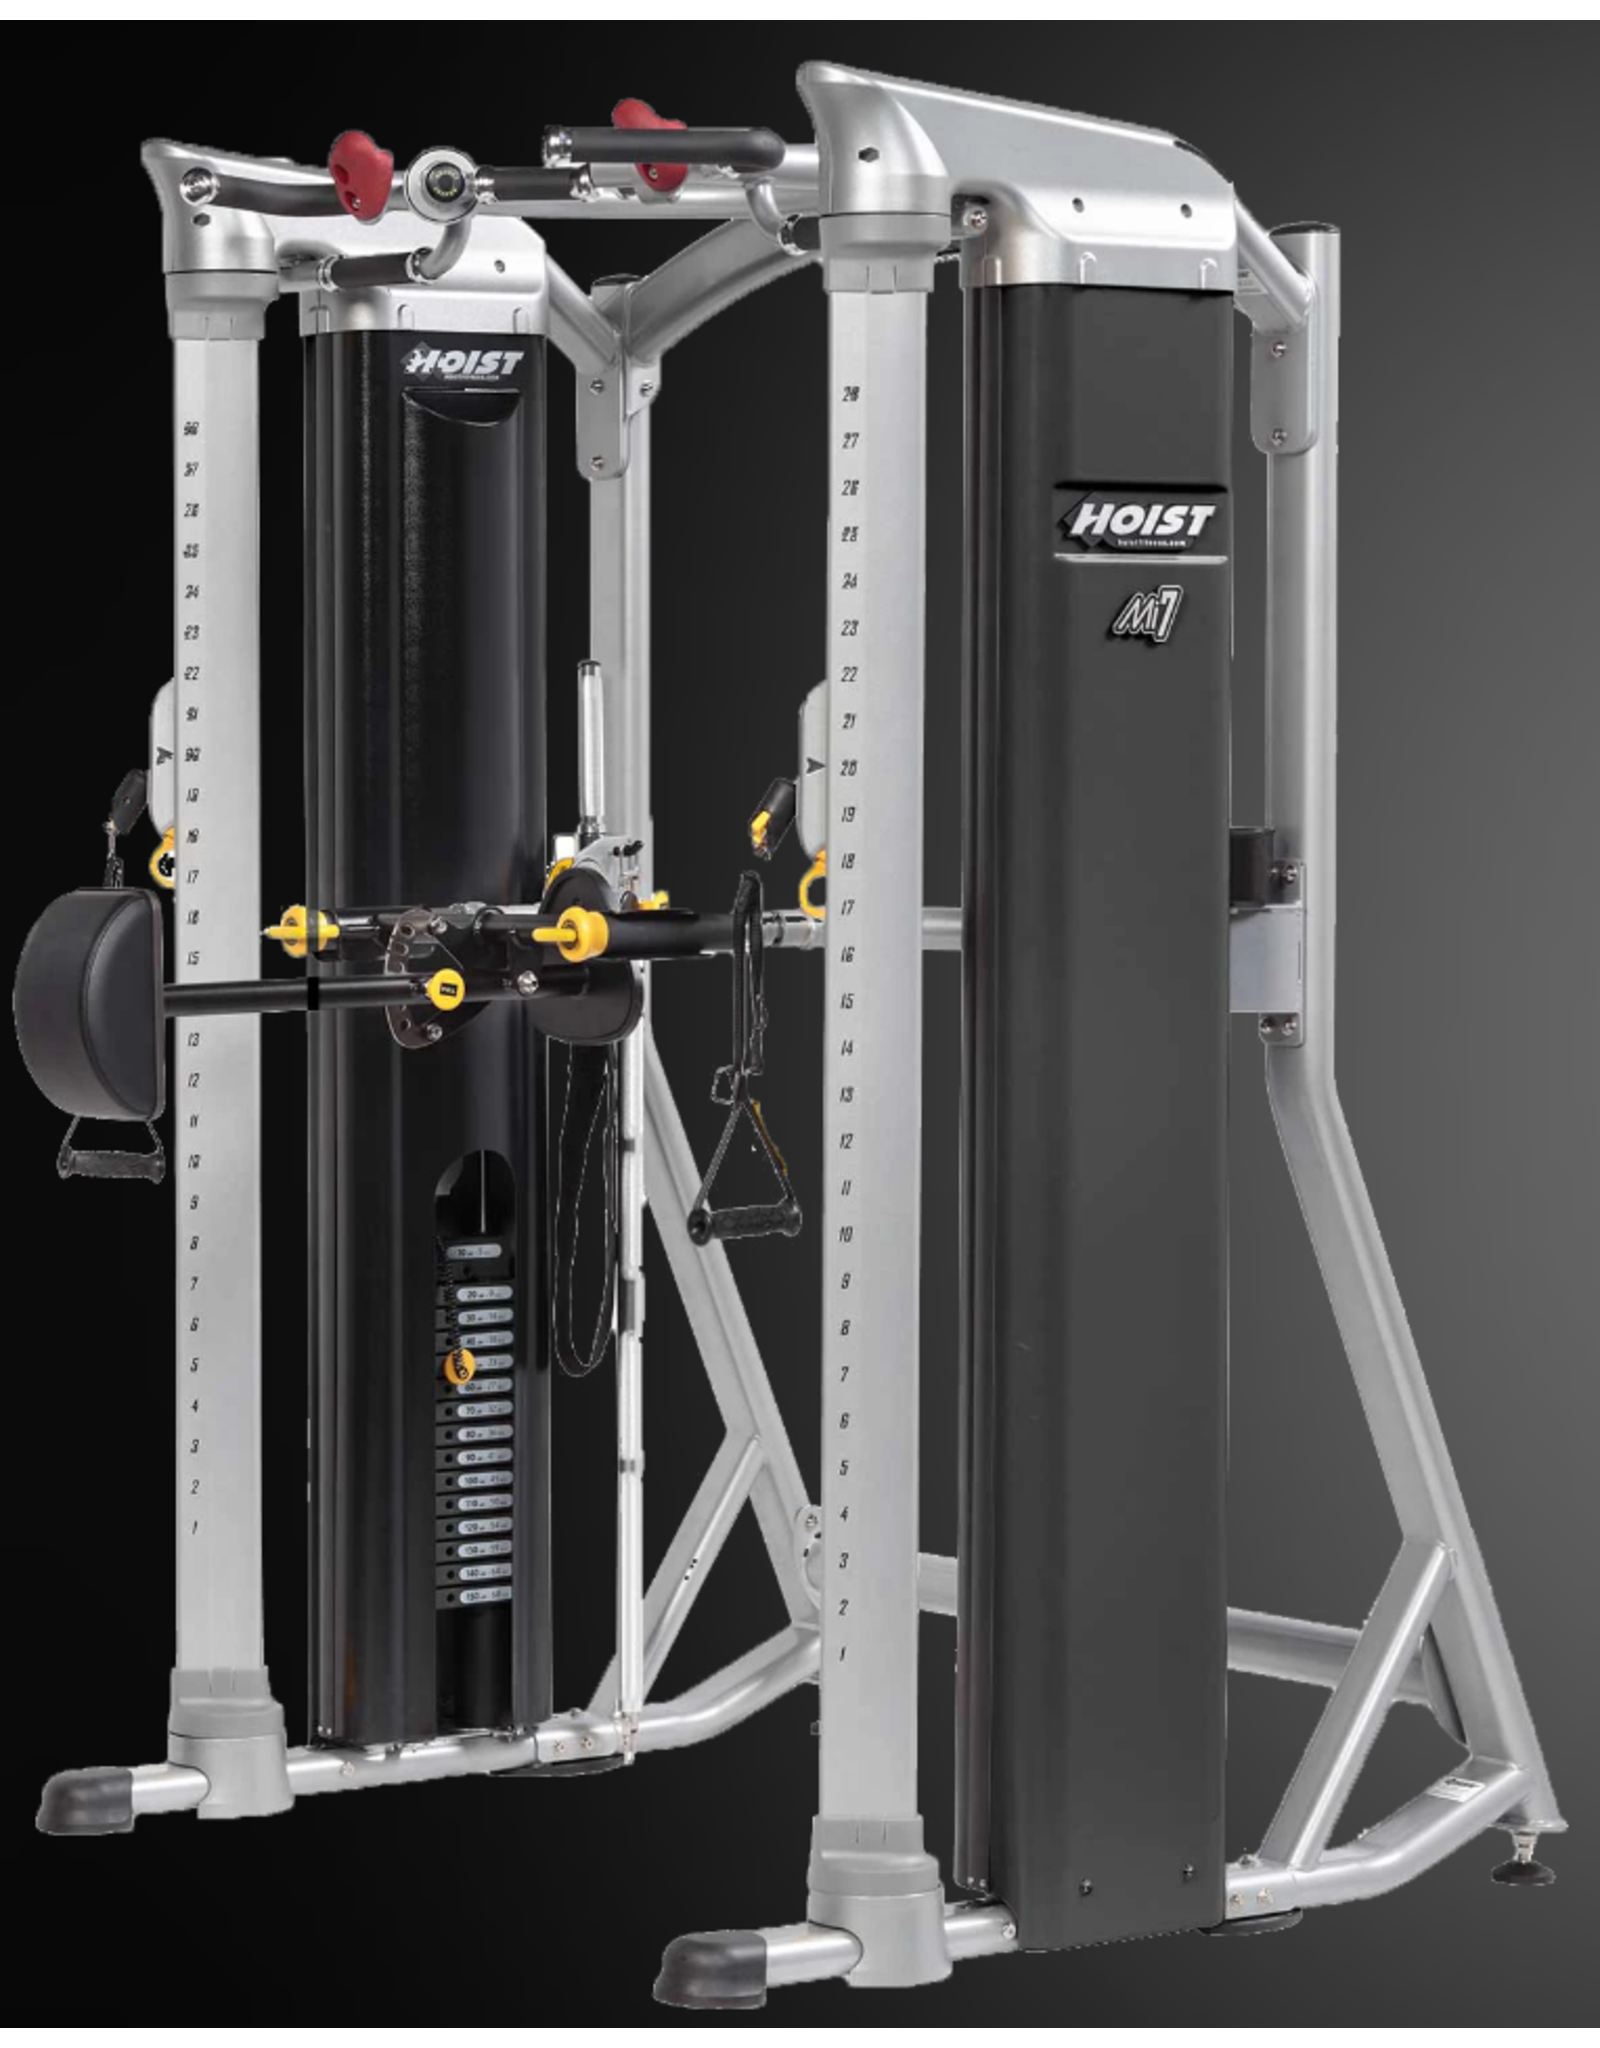 Hoist Hoist -  Mi7 Functional Training System